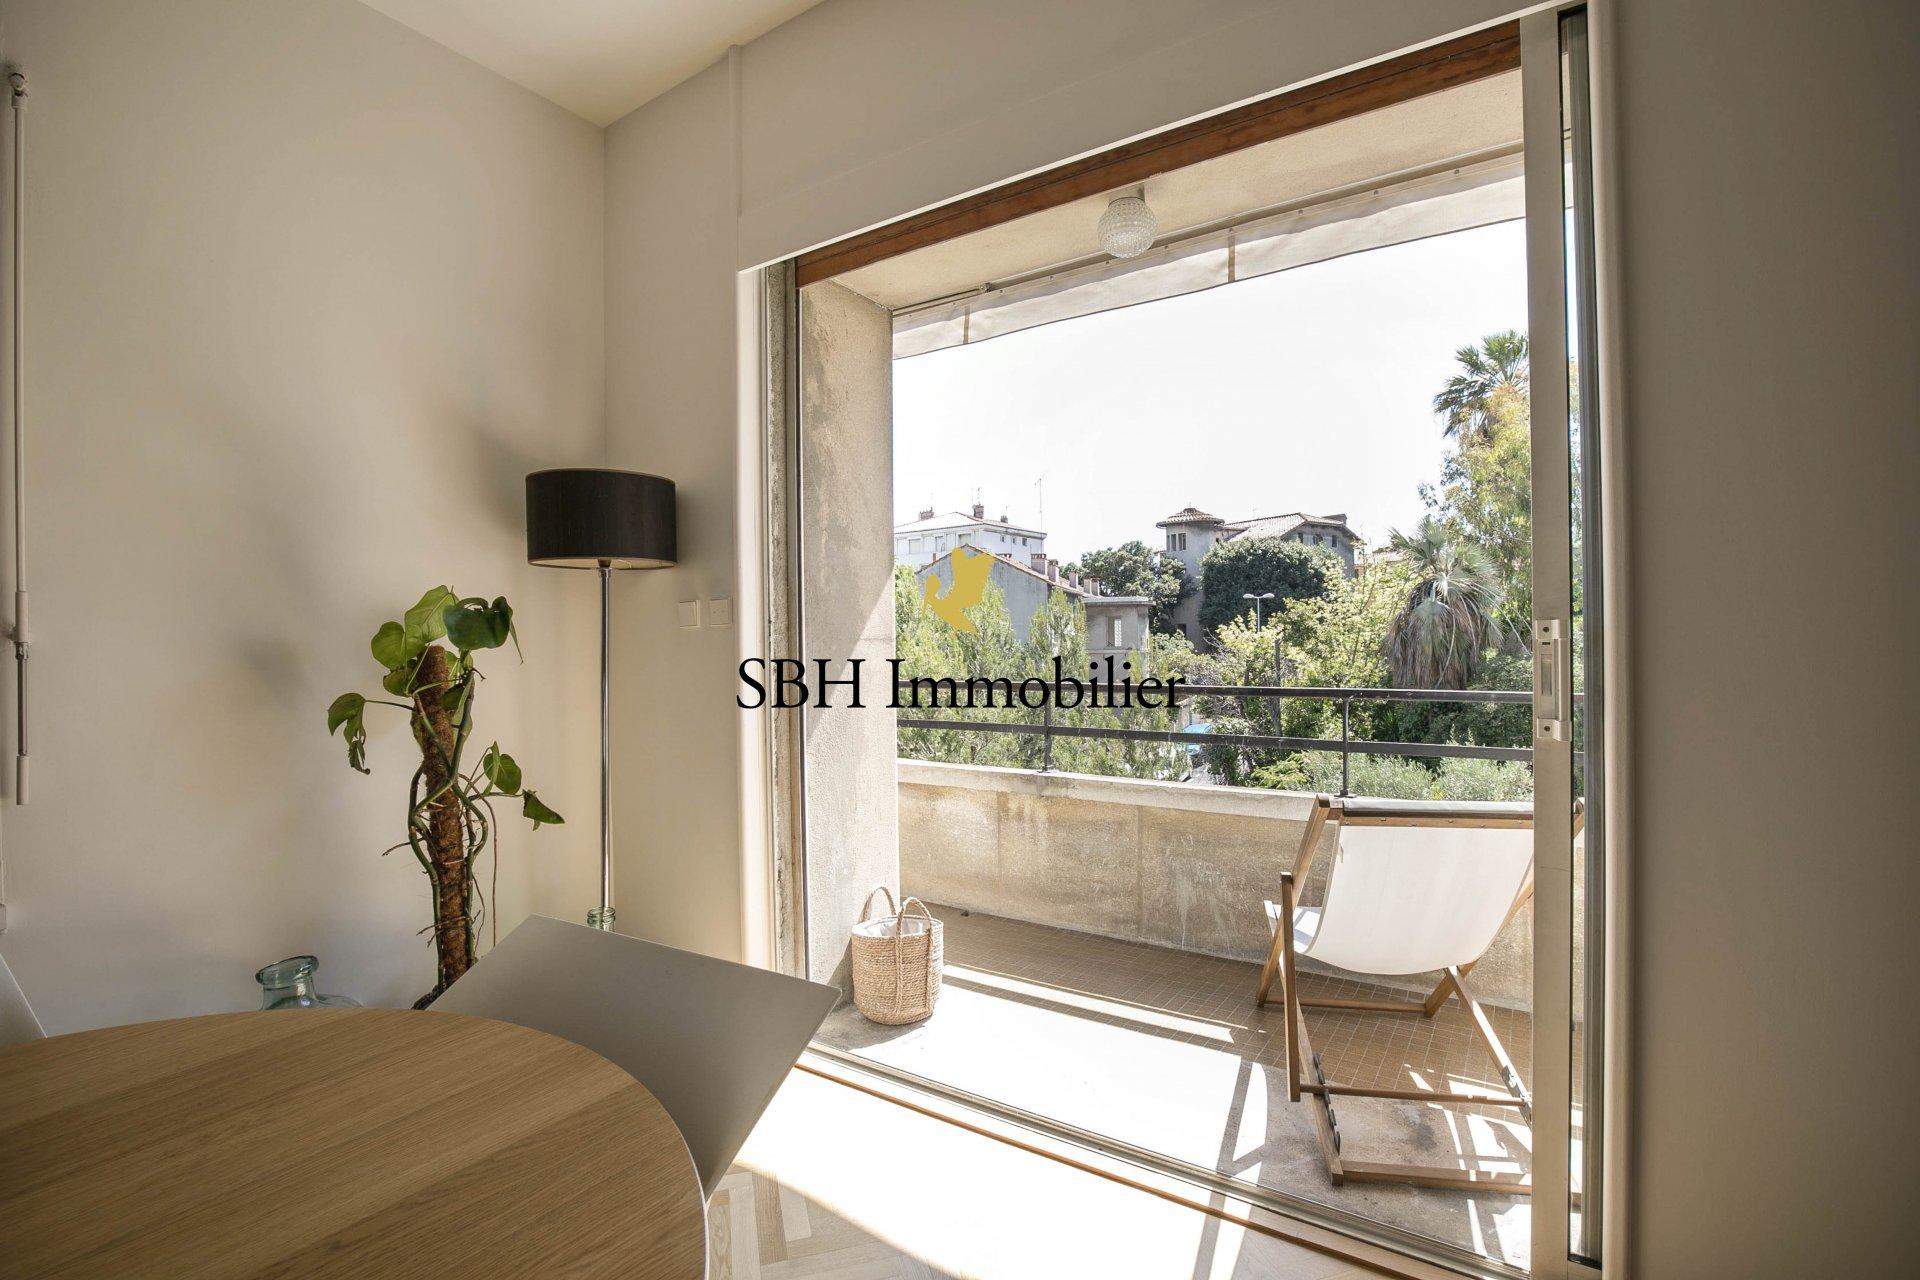 # VENDU #Appartement Monticelli